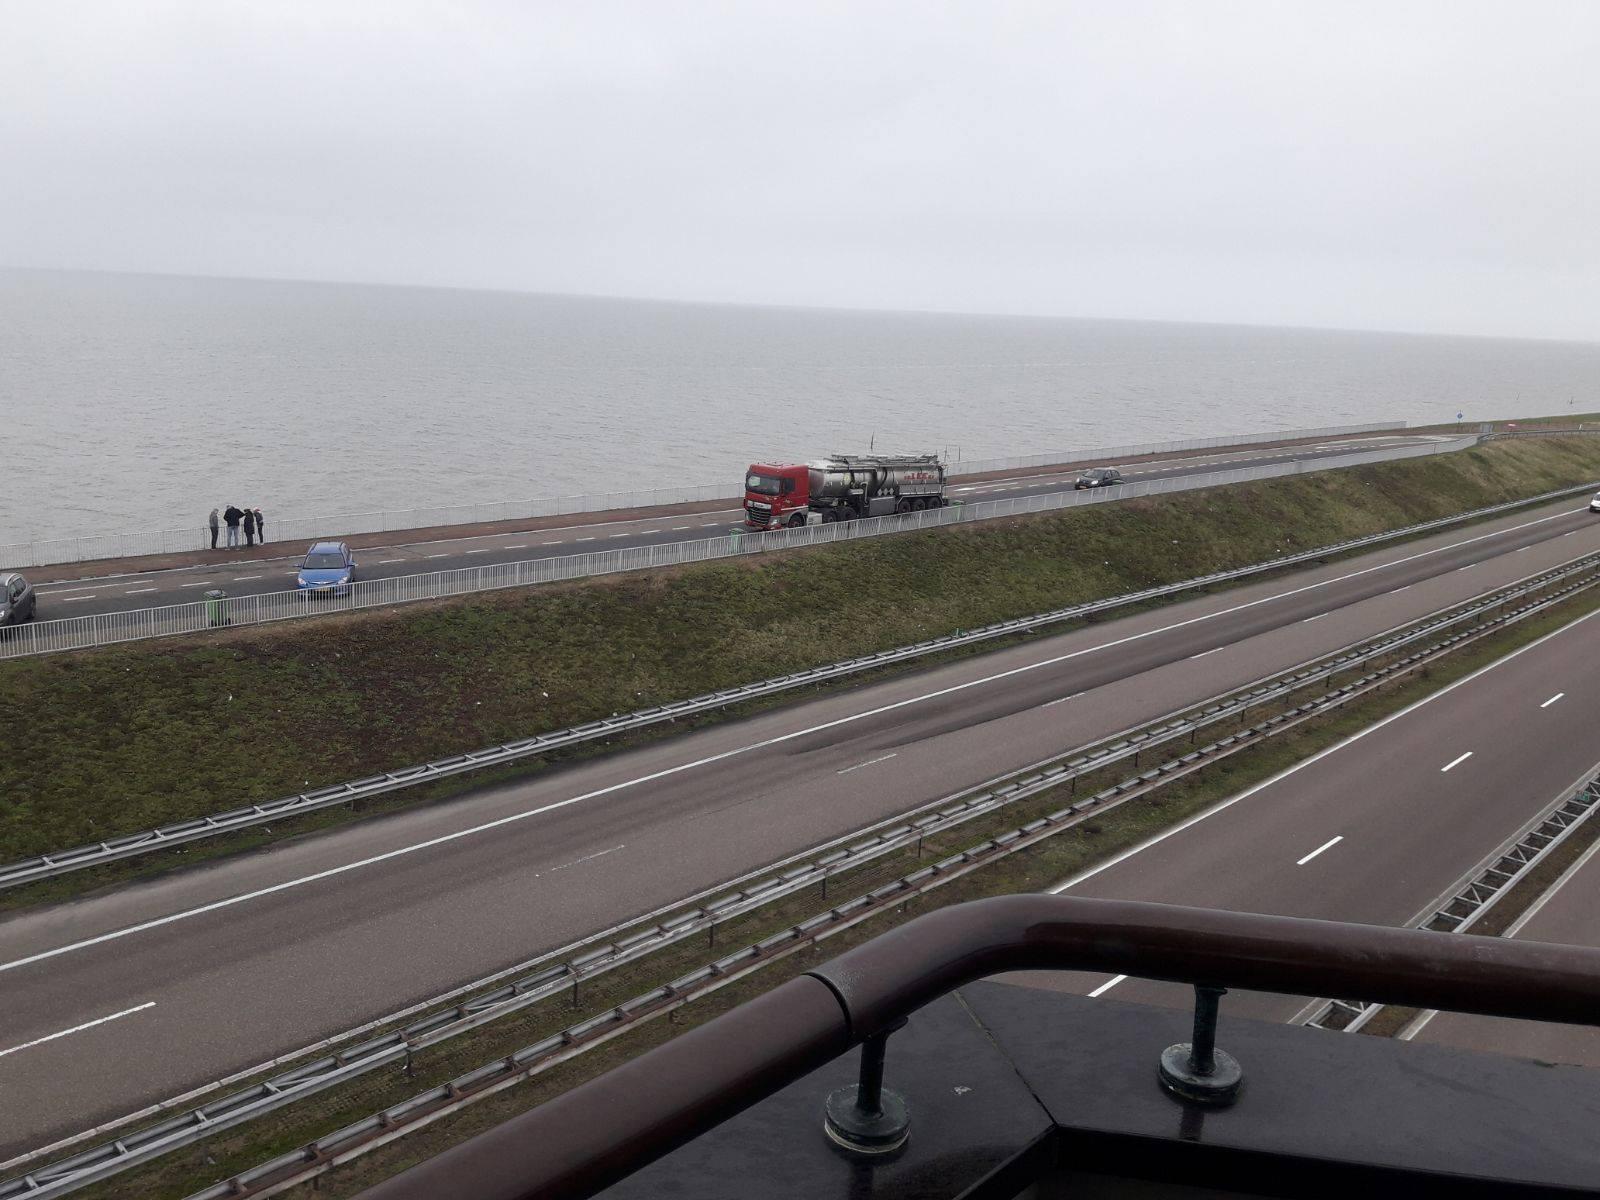 Arie-den-uil-afsuitdijk